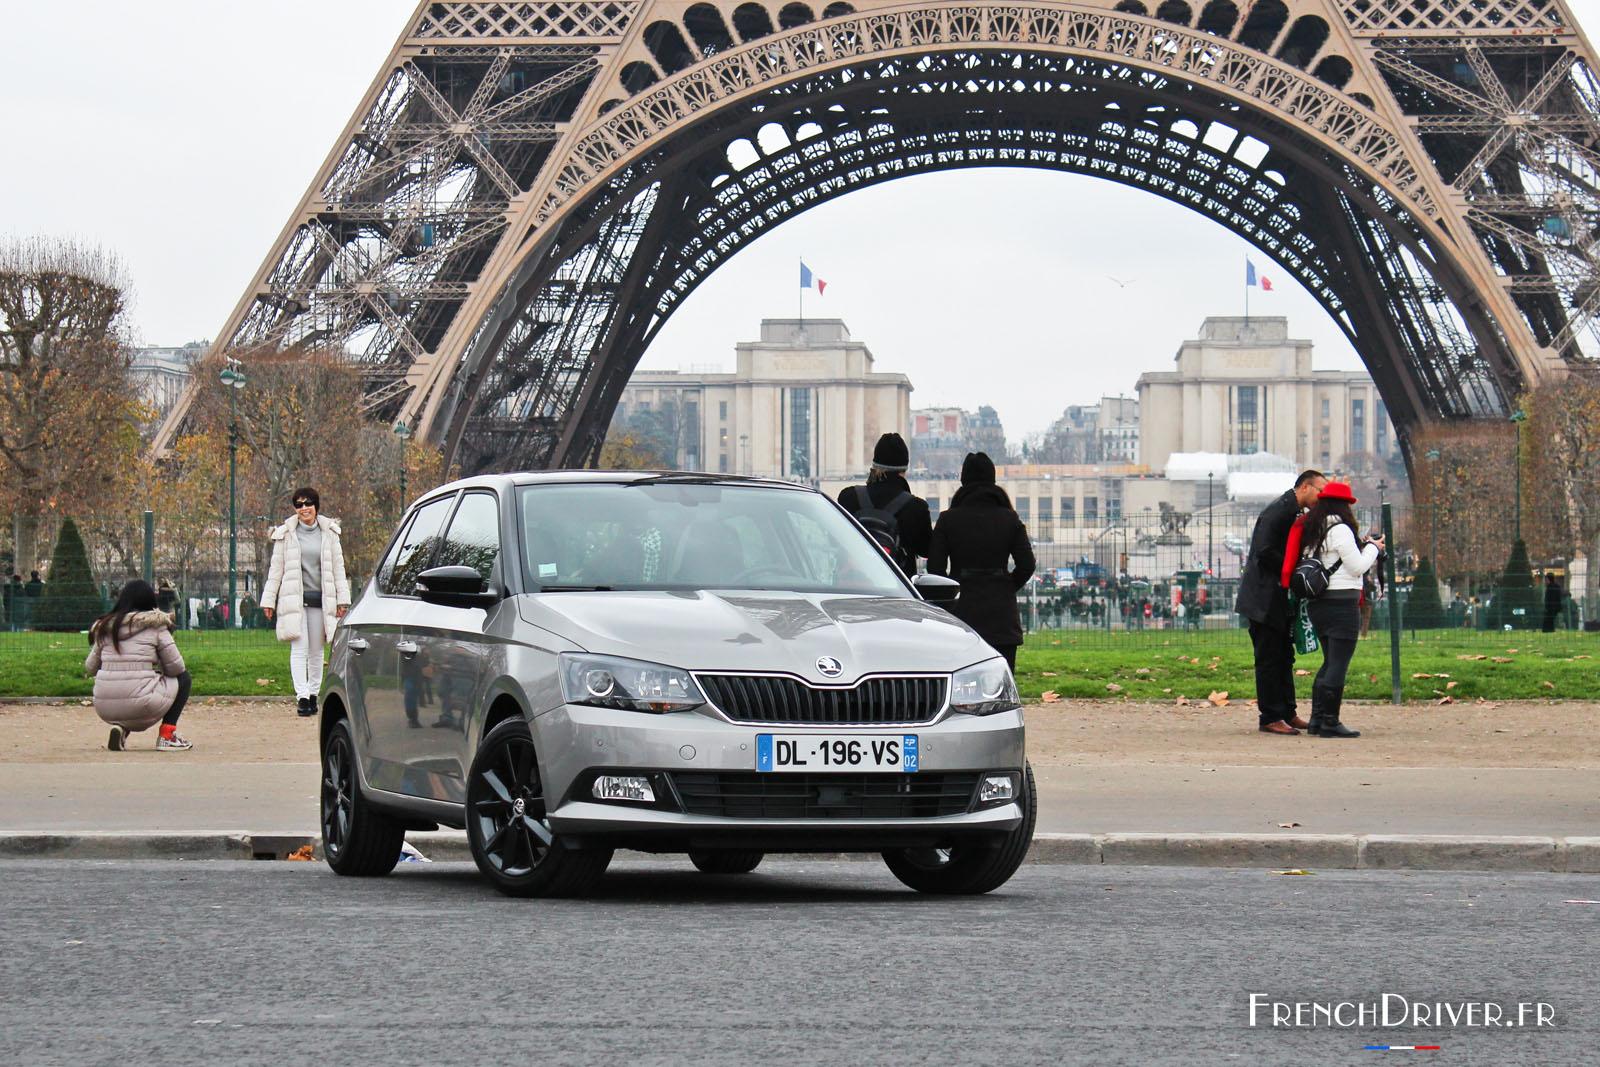 Essai de la nouvelle skoda fabia 3 french driver for Garage skoda paris 12